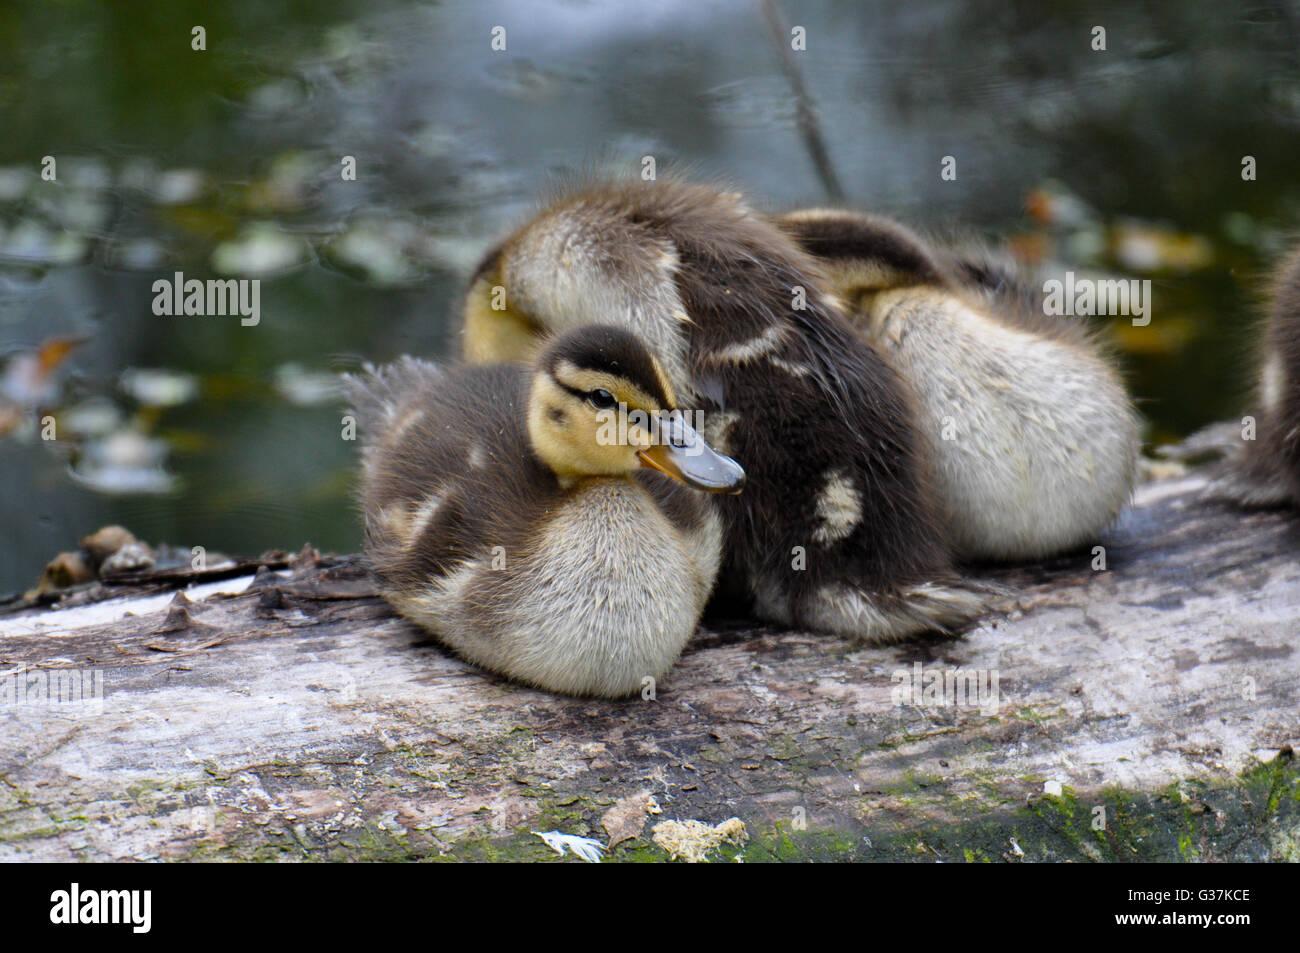 Mallard ducklings sitting on a log. - Stock Image